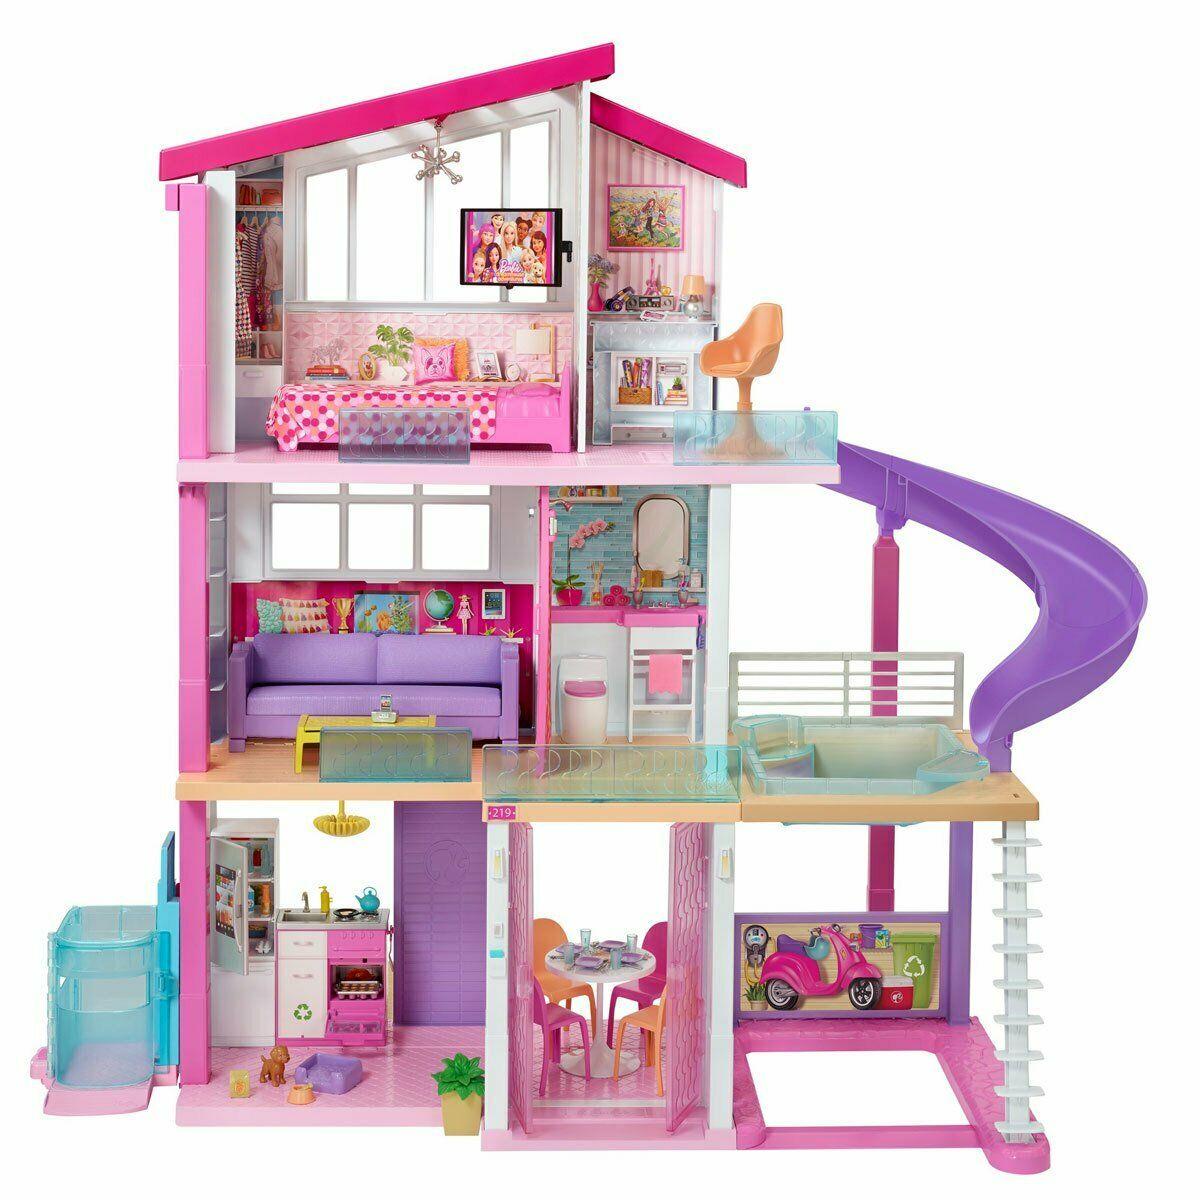 Barbie DreamHouse Playset - £183.99 delivered using code @ theentertainertoyshop / eBay (UK Mainland)